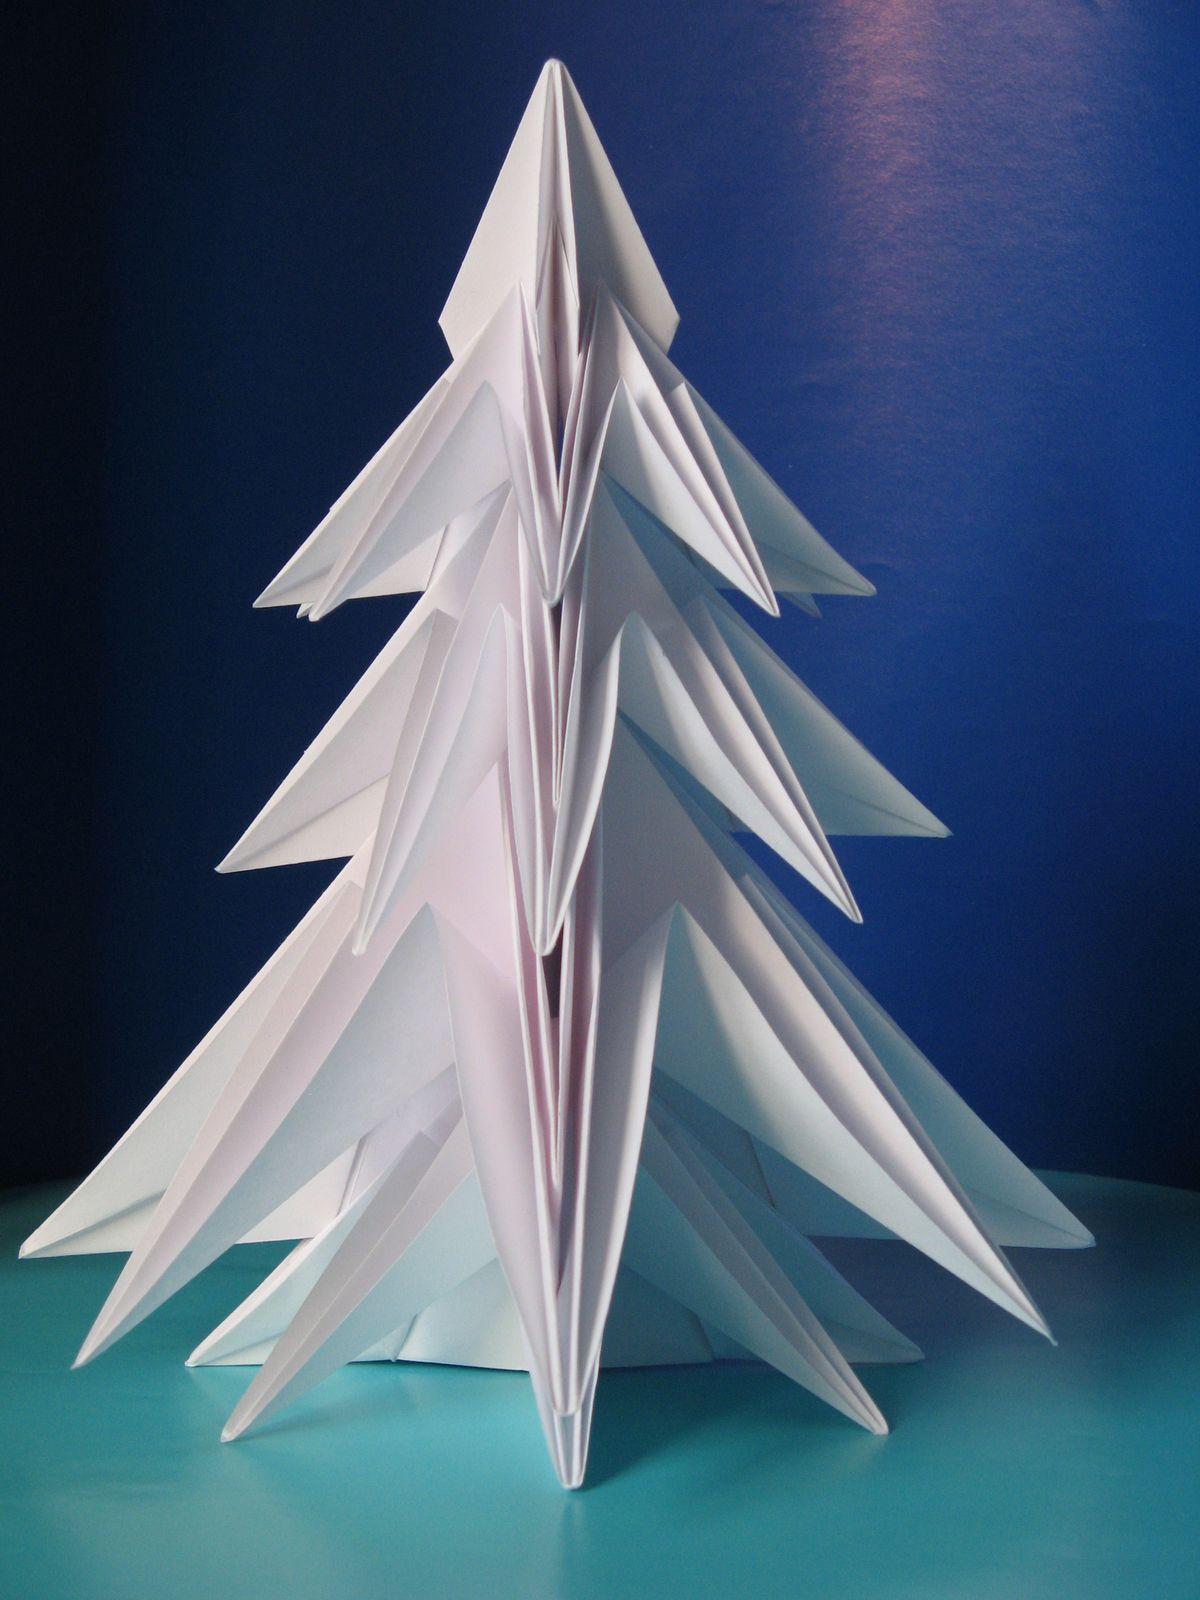 origami Abete 2 - Fir tree 2 by Francesco Guarnieri